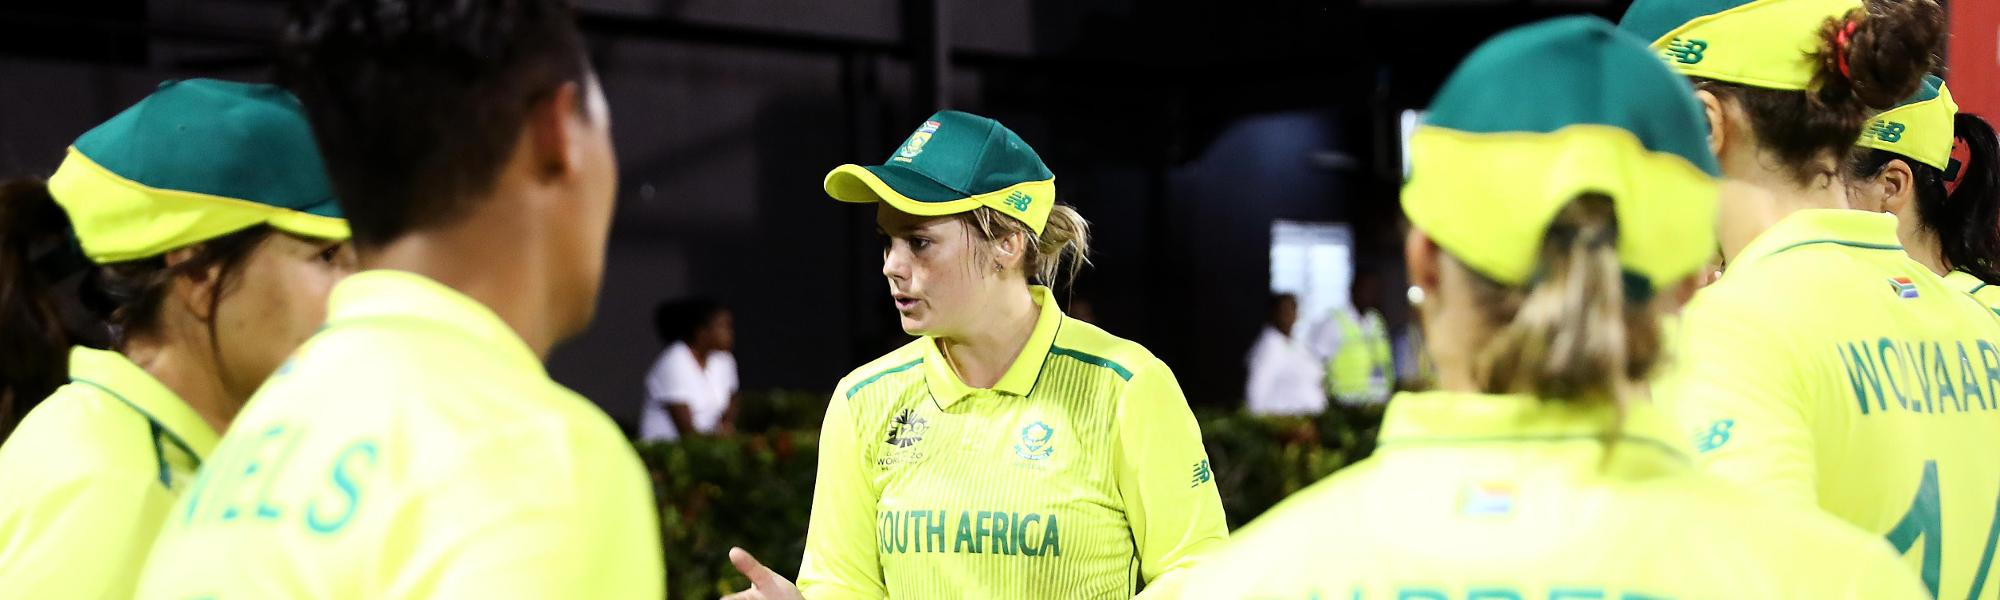 South Africa Women WT20